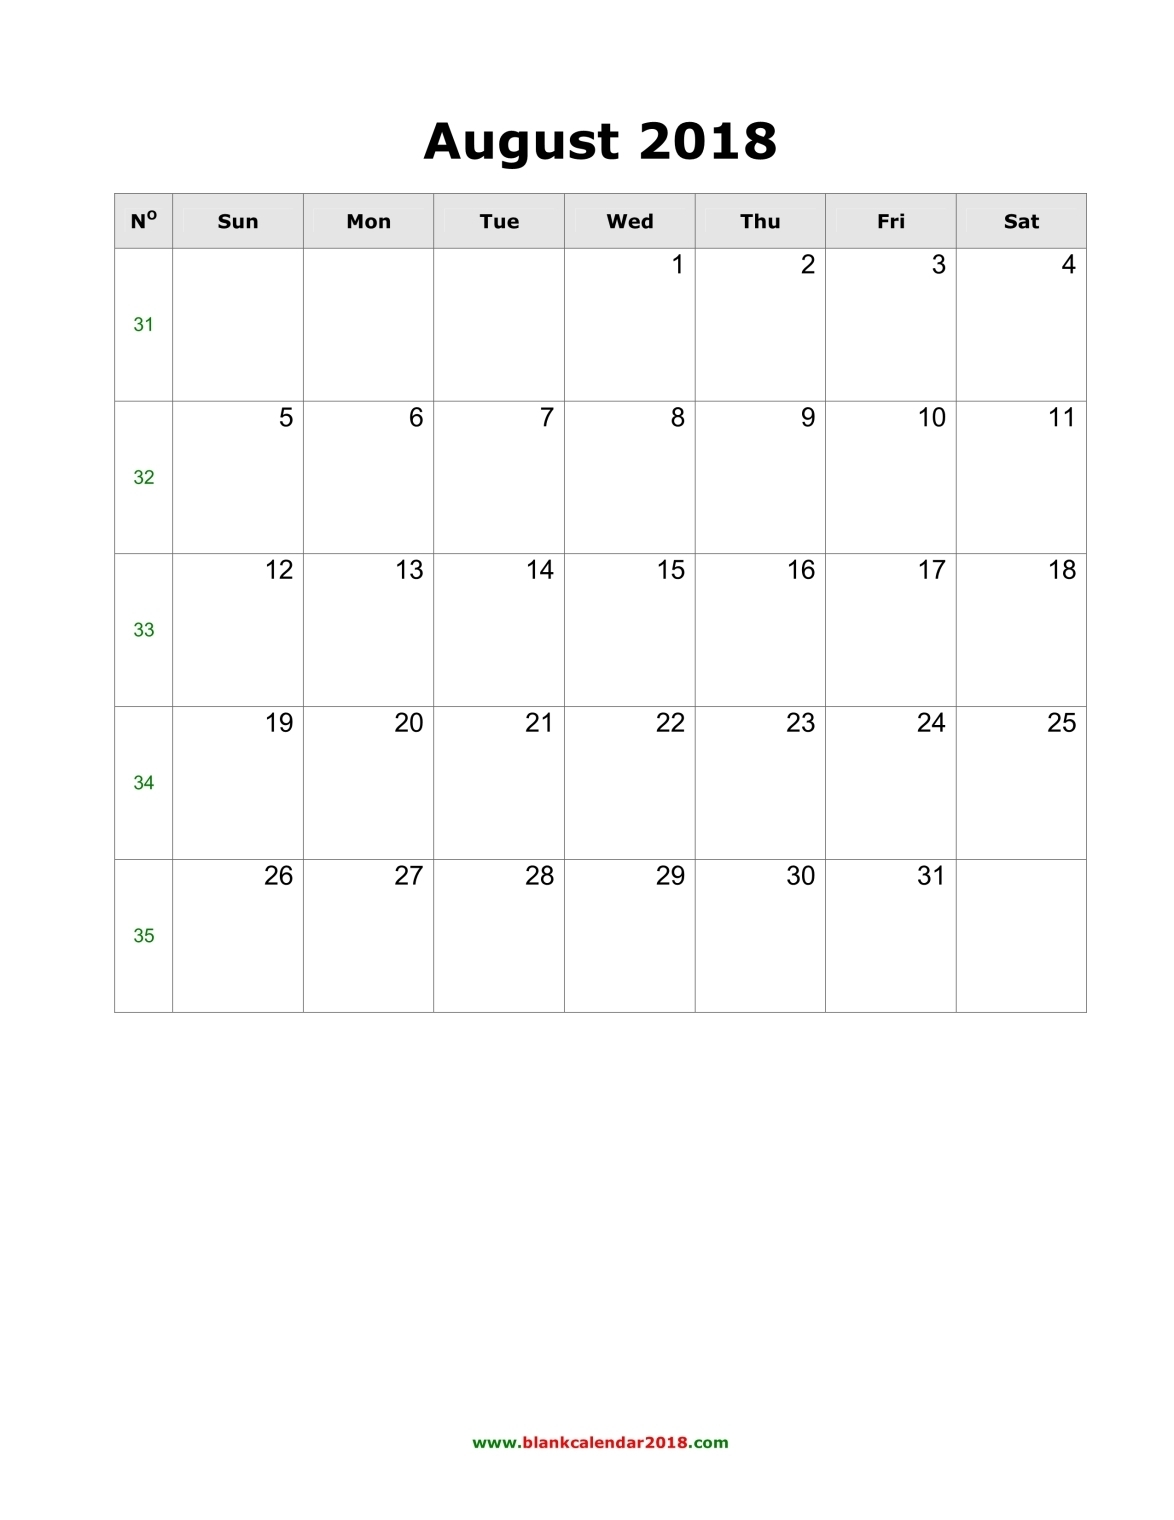 Blank Calendar for August 2018